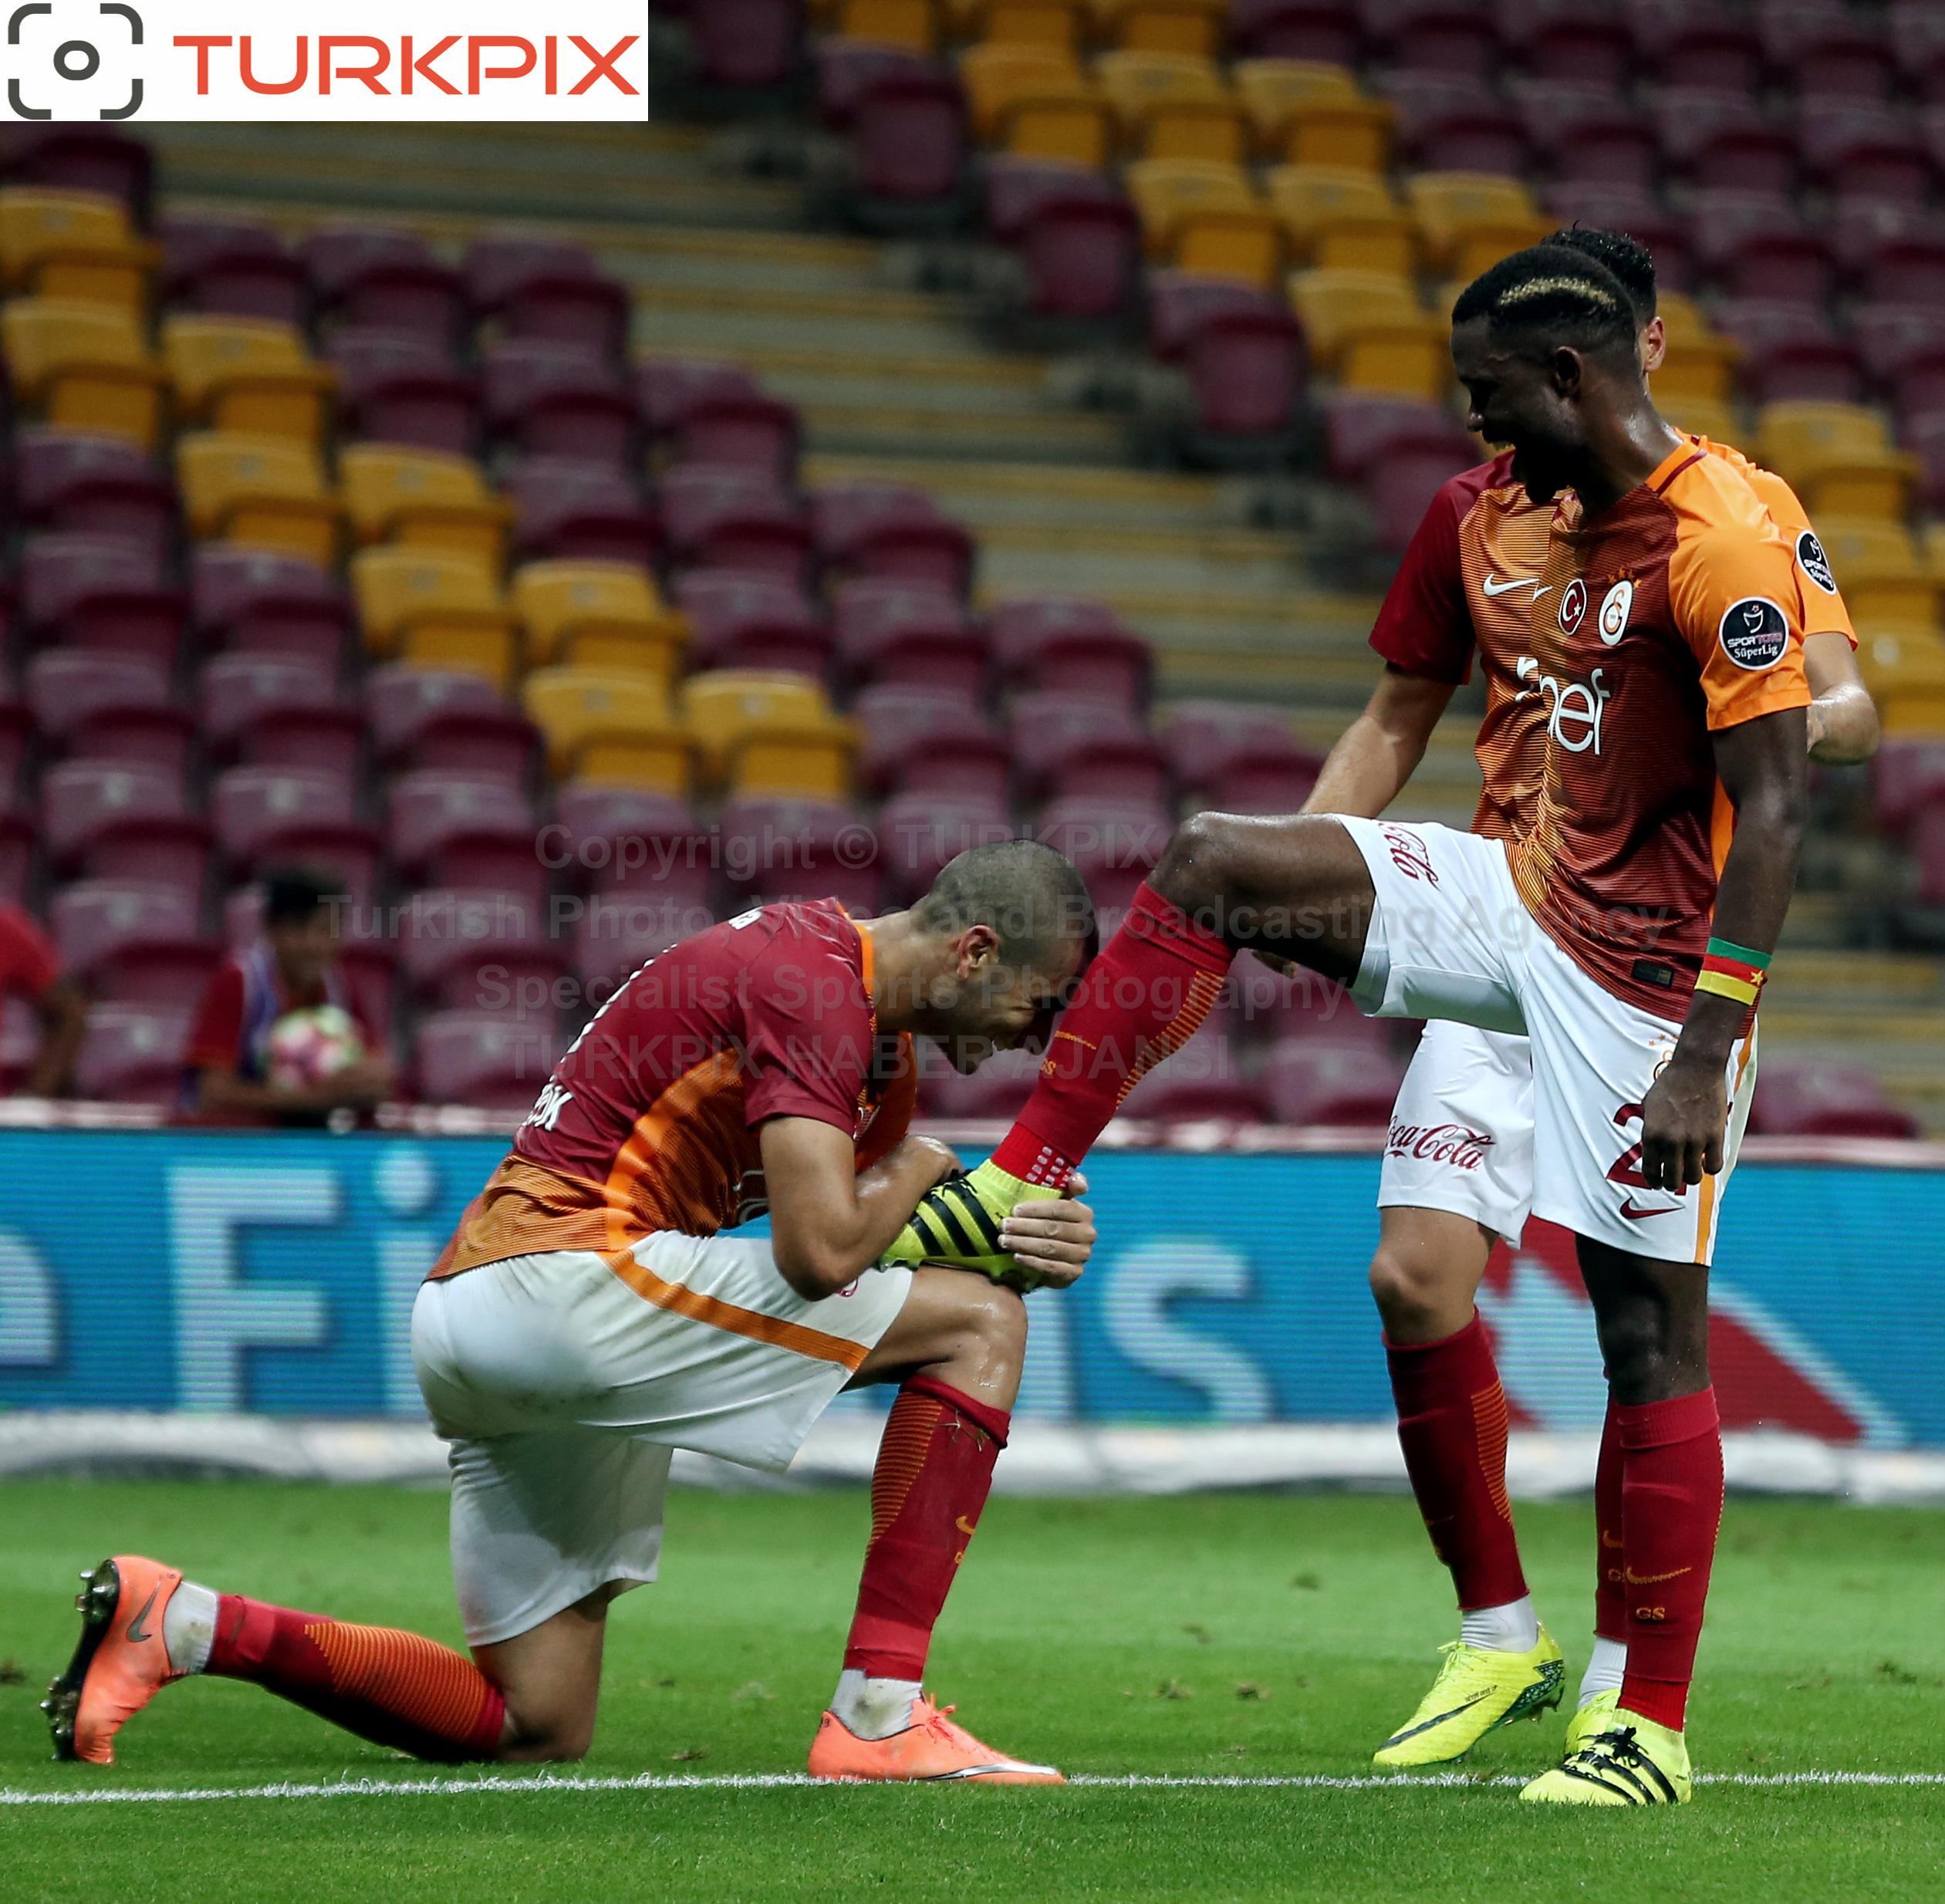 Copyright-TURKPIX-HABER-AJANSI-Galatasaray-v-Kardemir-Karabukspor-22082016-1533468